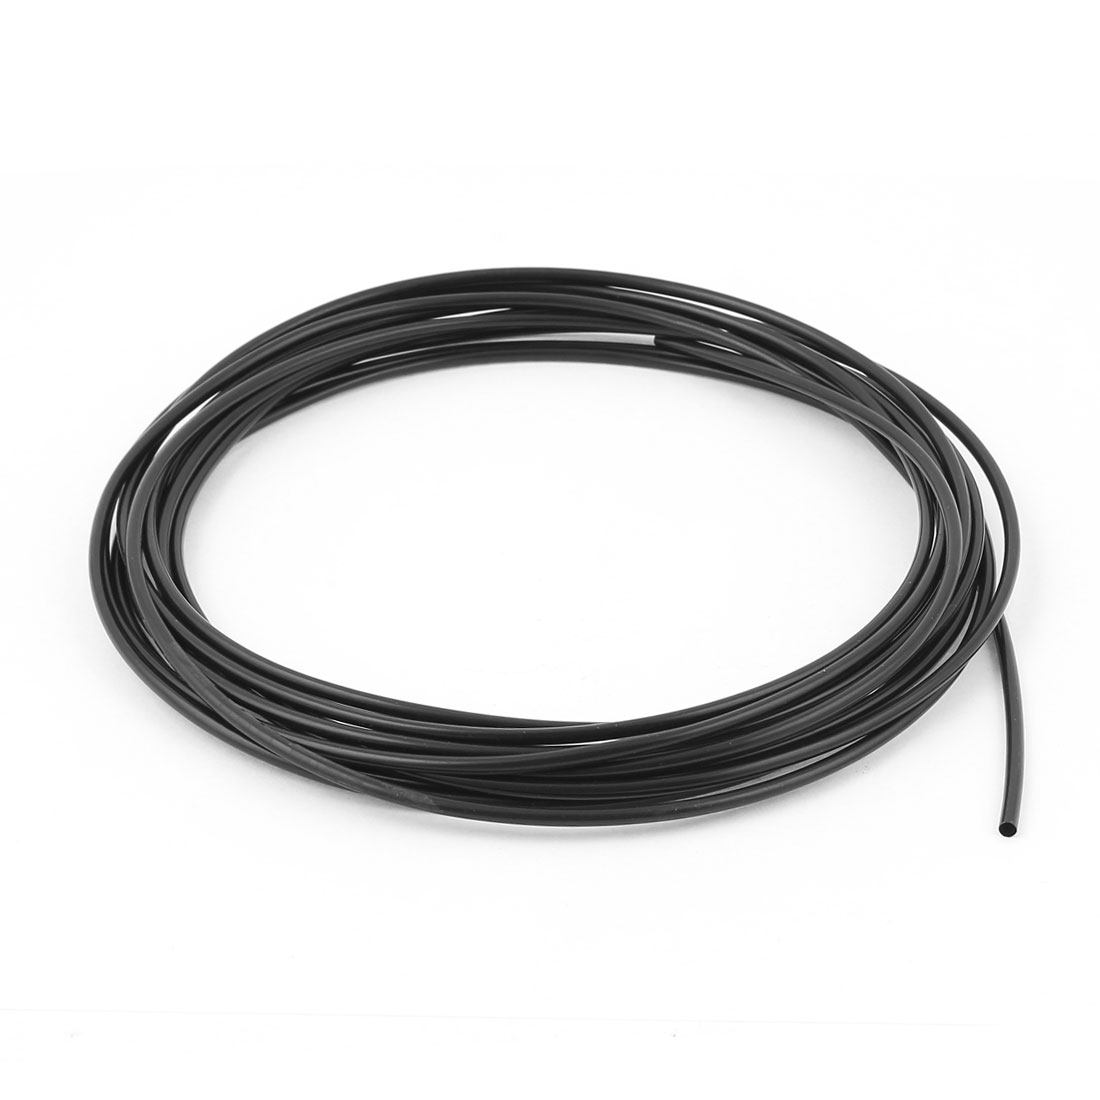 Uxcell Od 2Mm Dia Polyolefin Ratio 2:1 Heat Shrink Tubing Tube Wire Wrap Black .10m4m5m6m9m